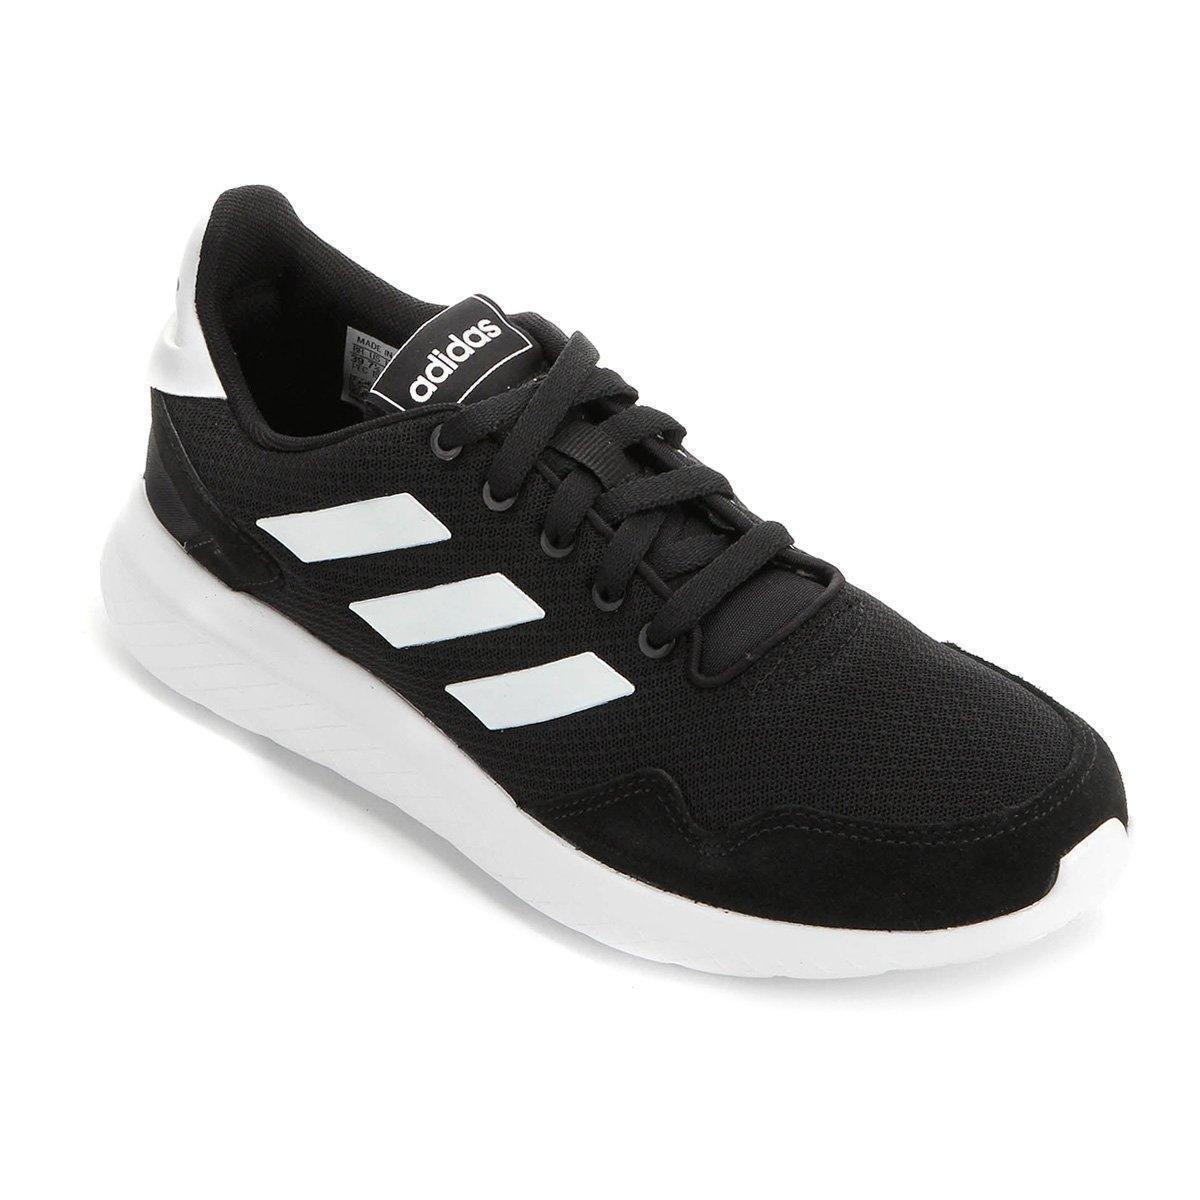 Tênis Adidas Wish - Preto